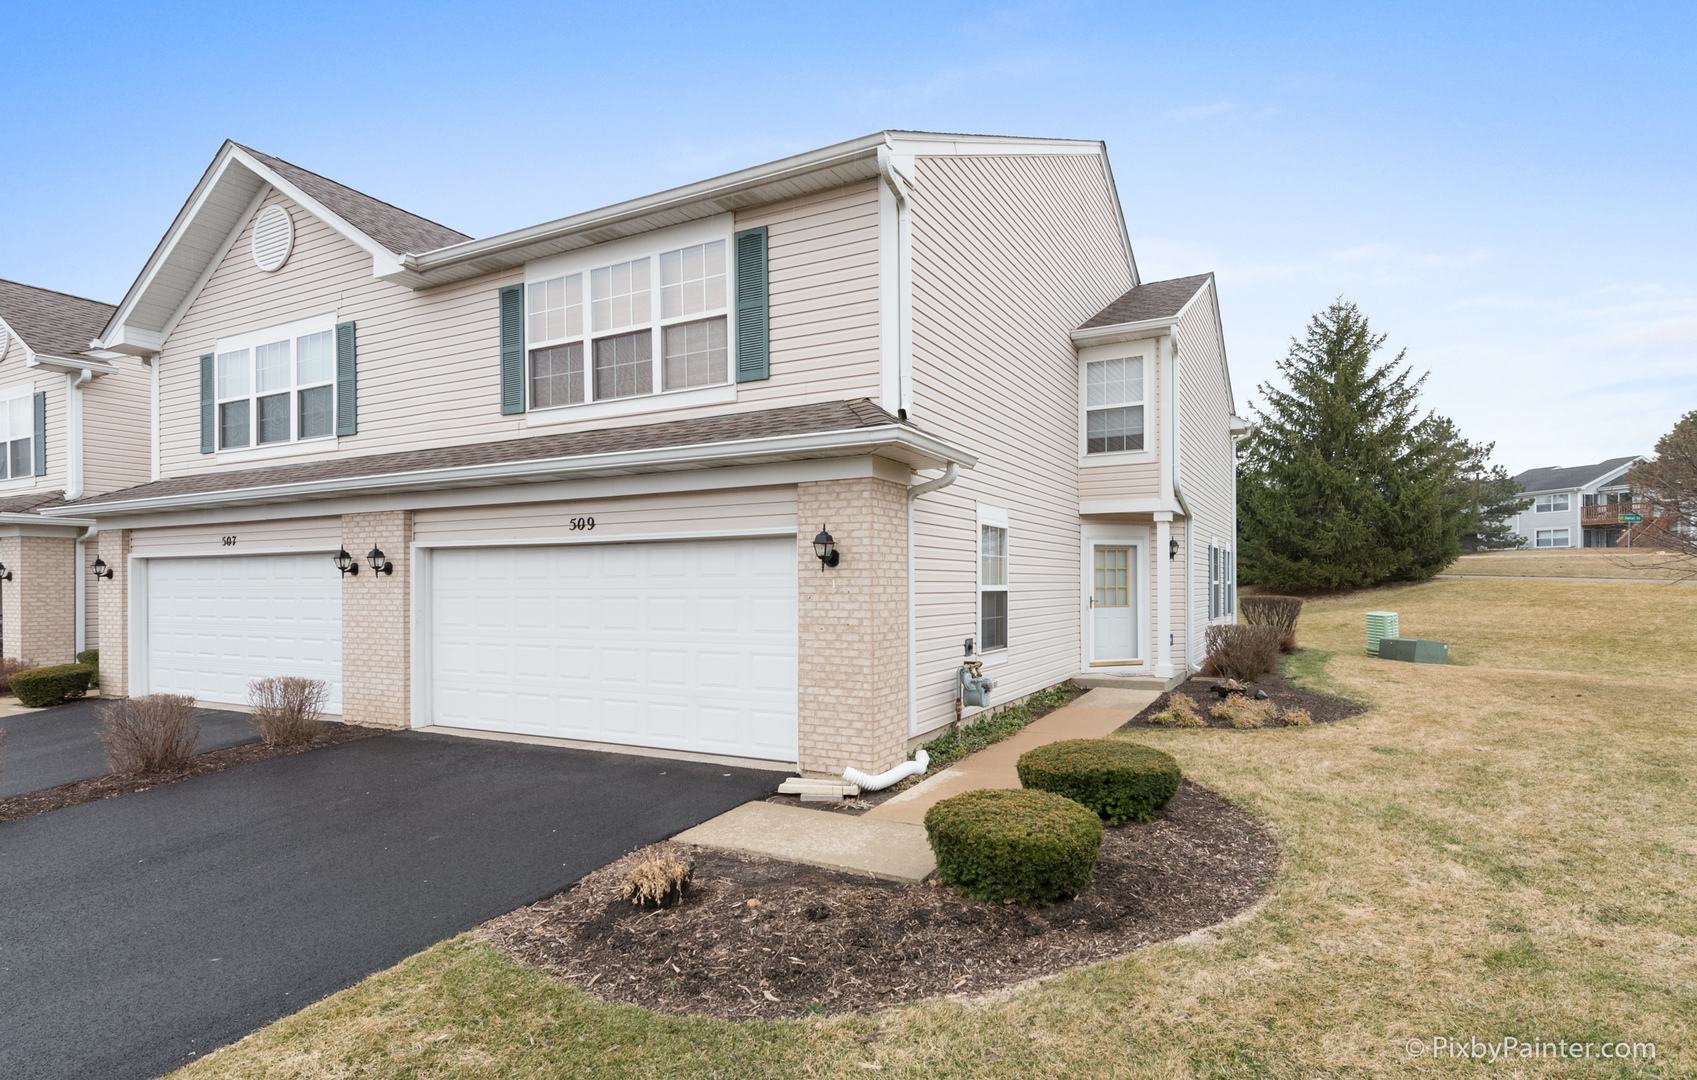 509 Windham Cove Drive, Crystal Lake, Illinois